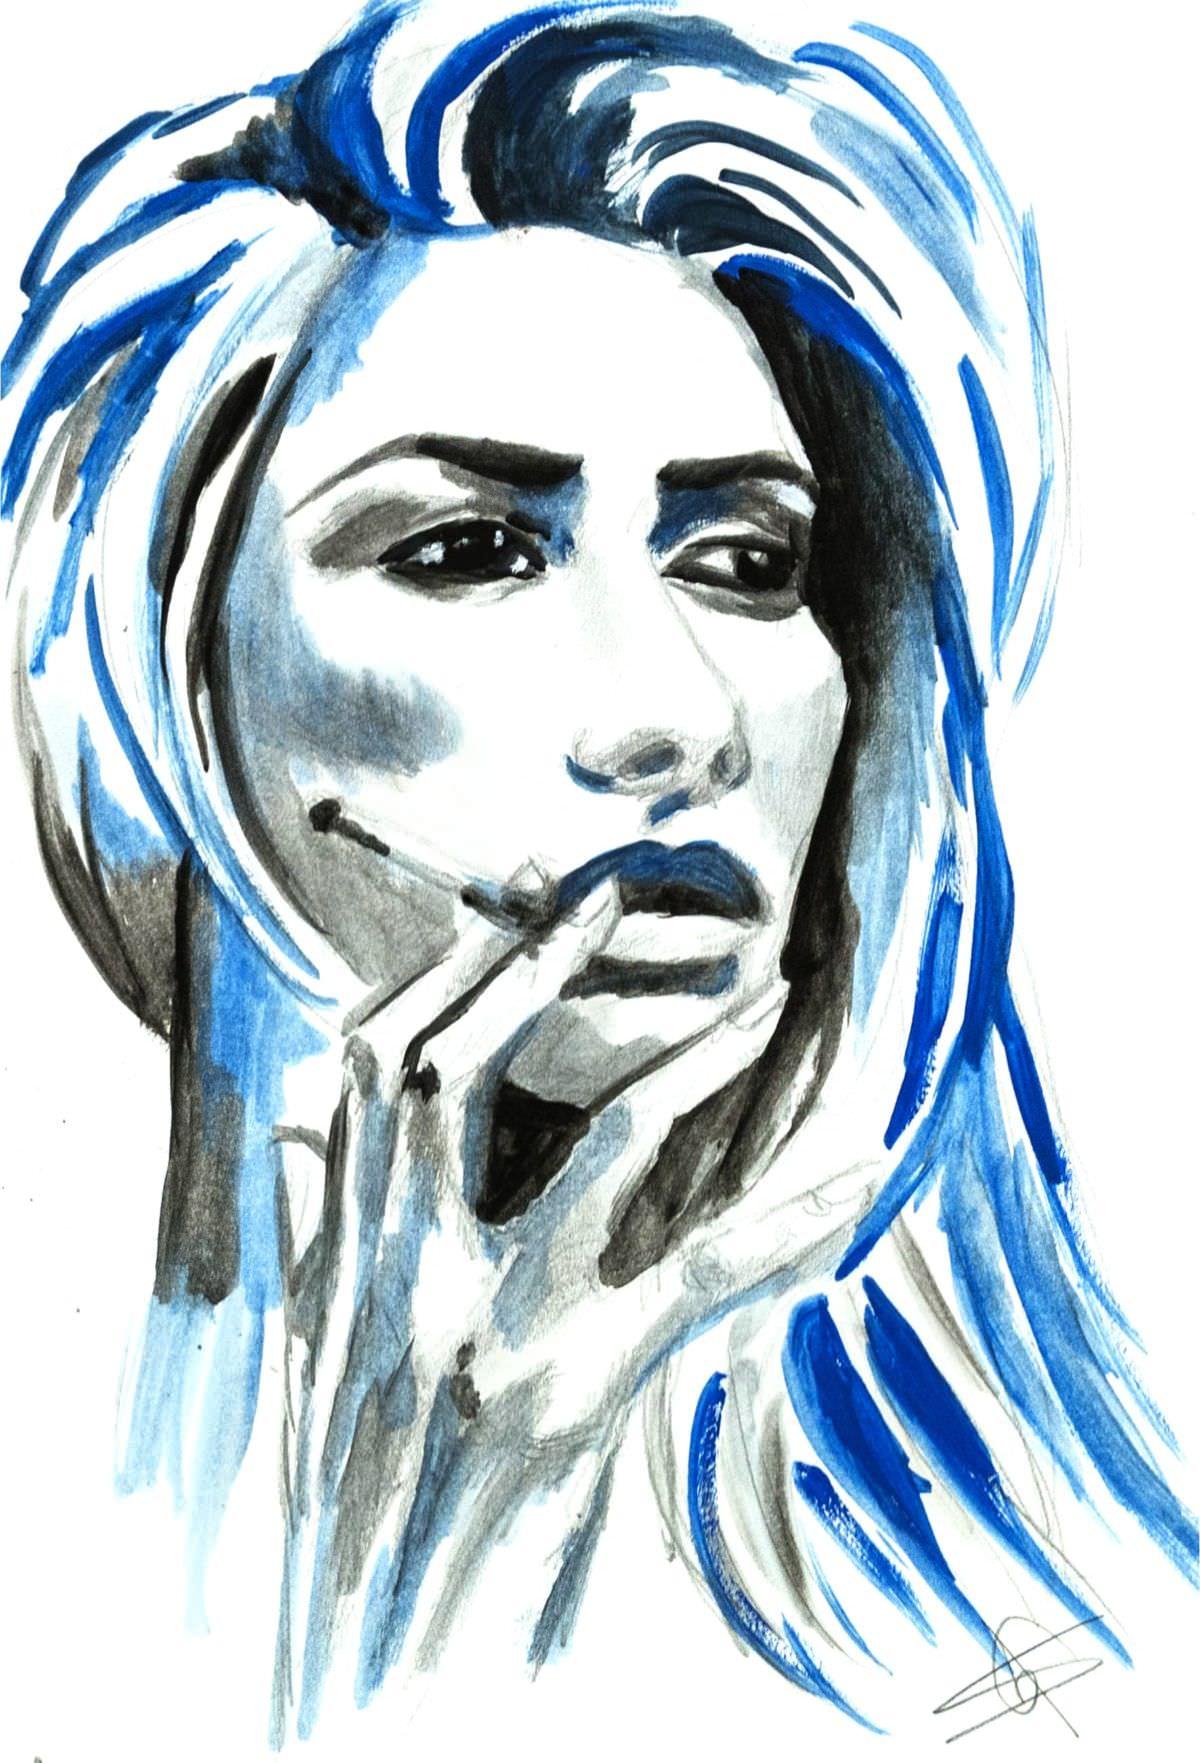 The smoker - Samantha Gandin